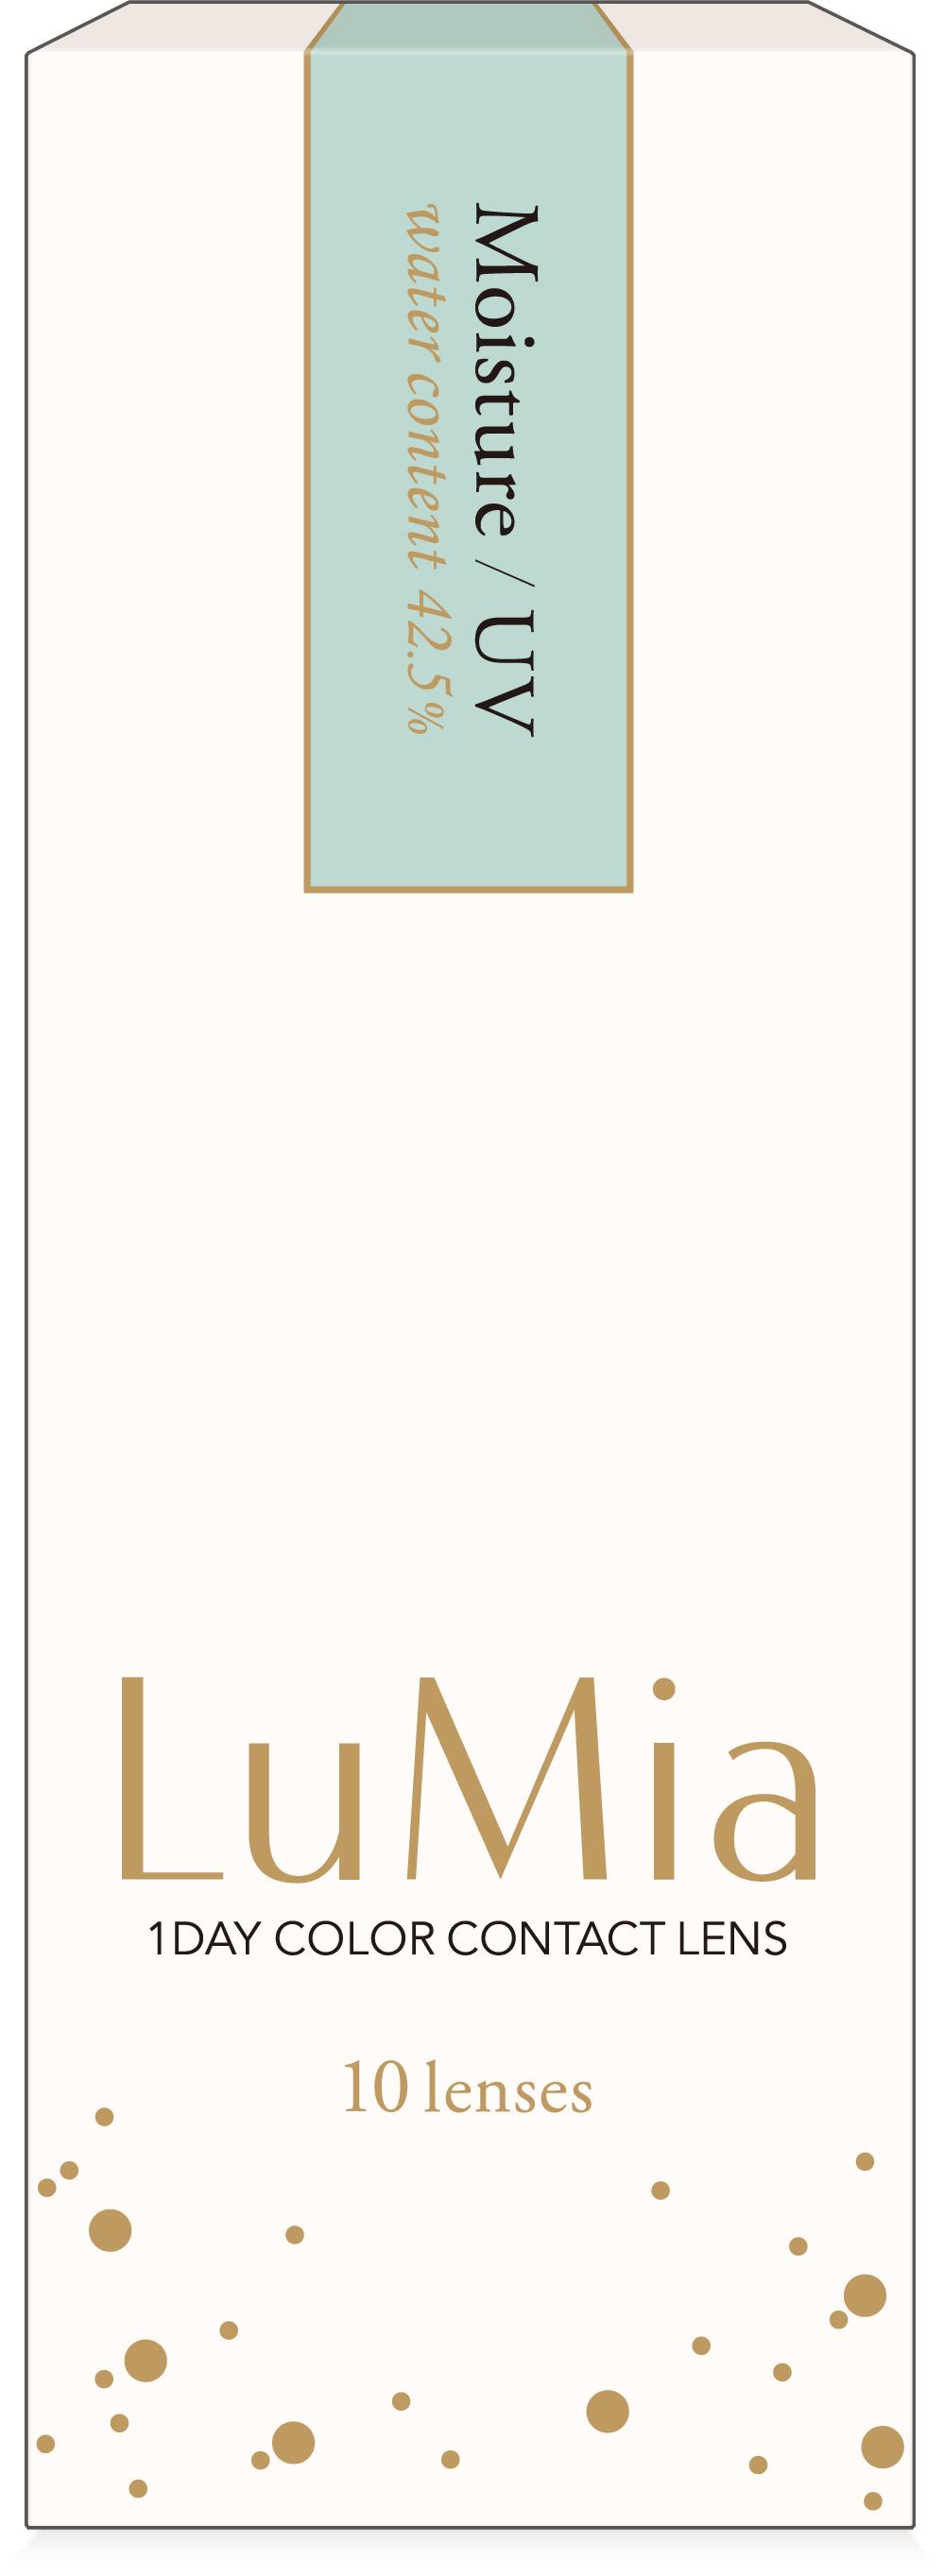 『LuMia(ルミア)』 イメージ